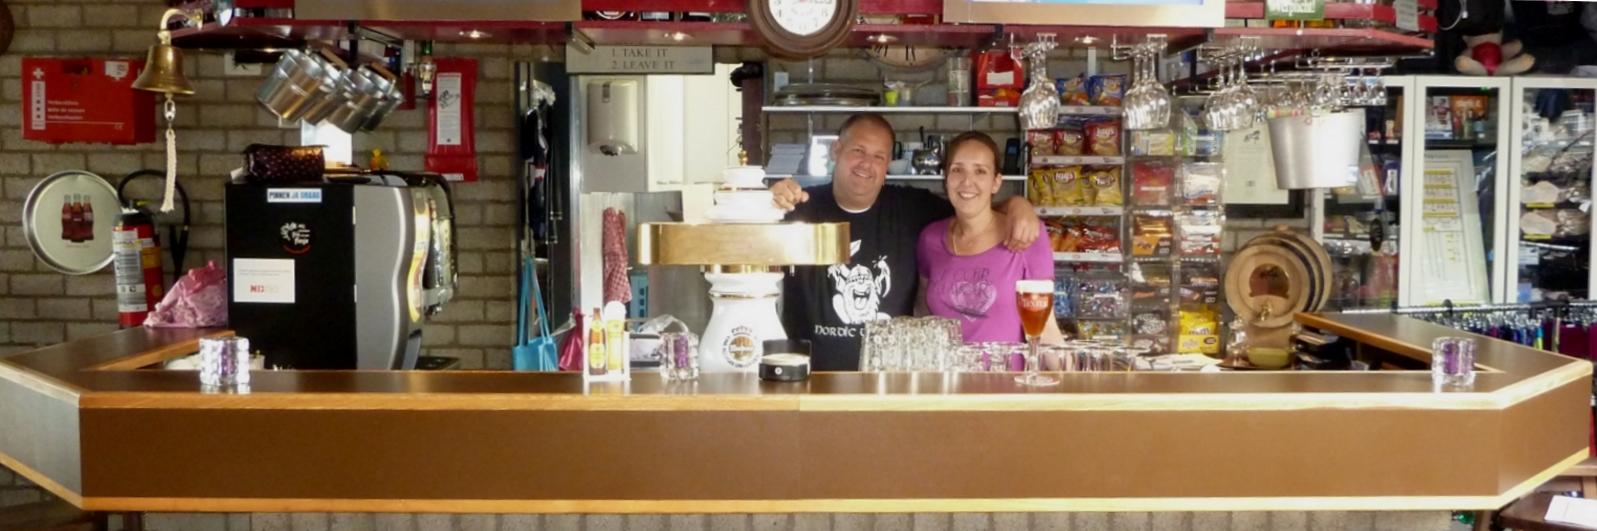 Bar Broekplein